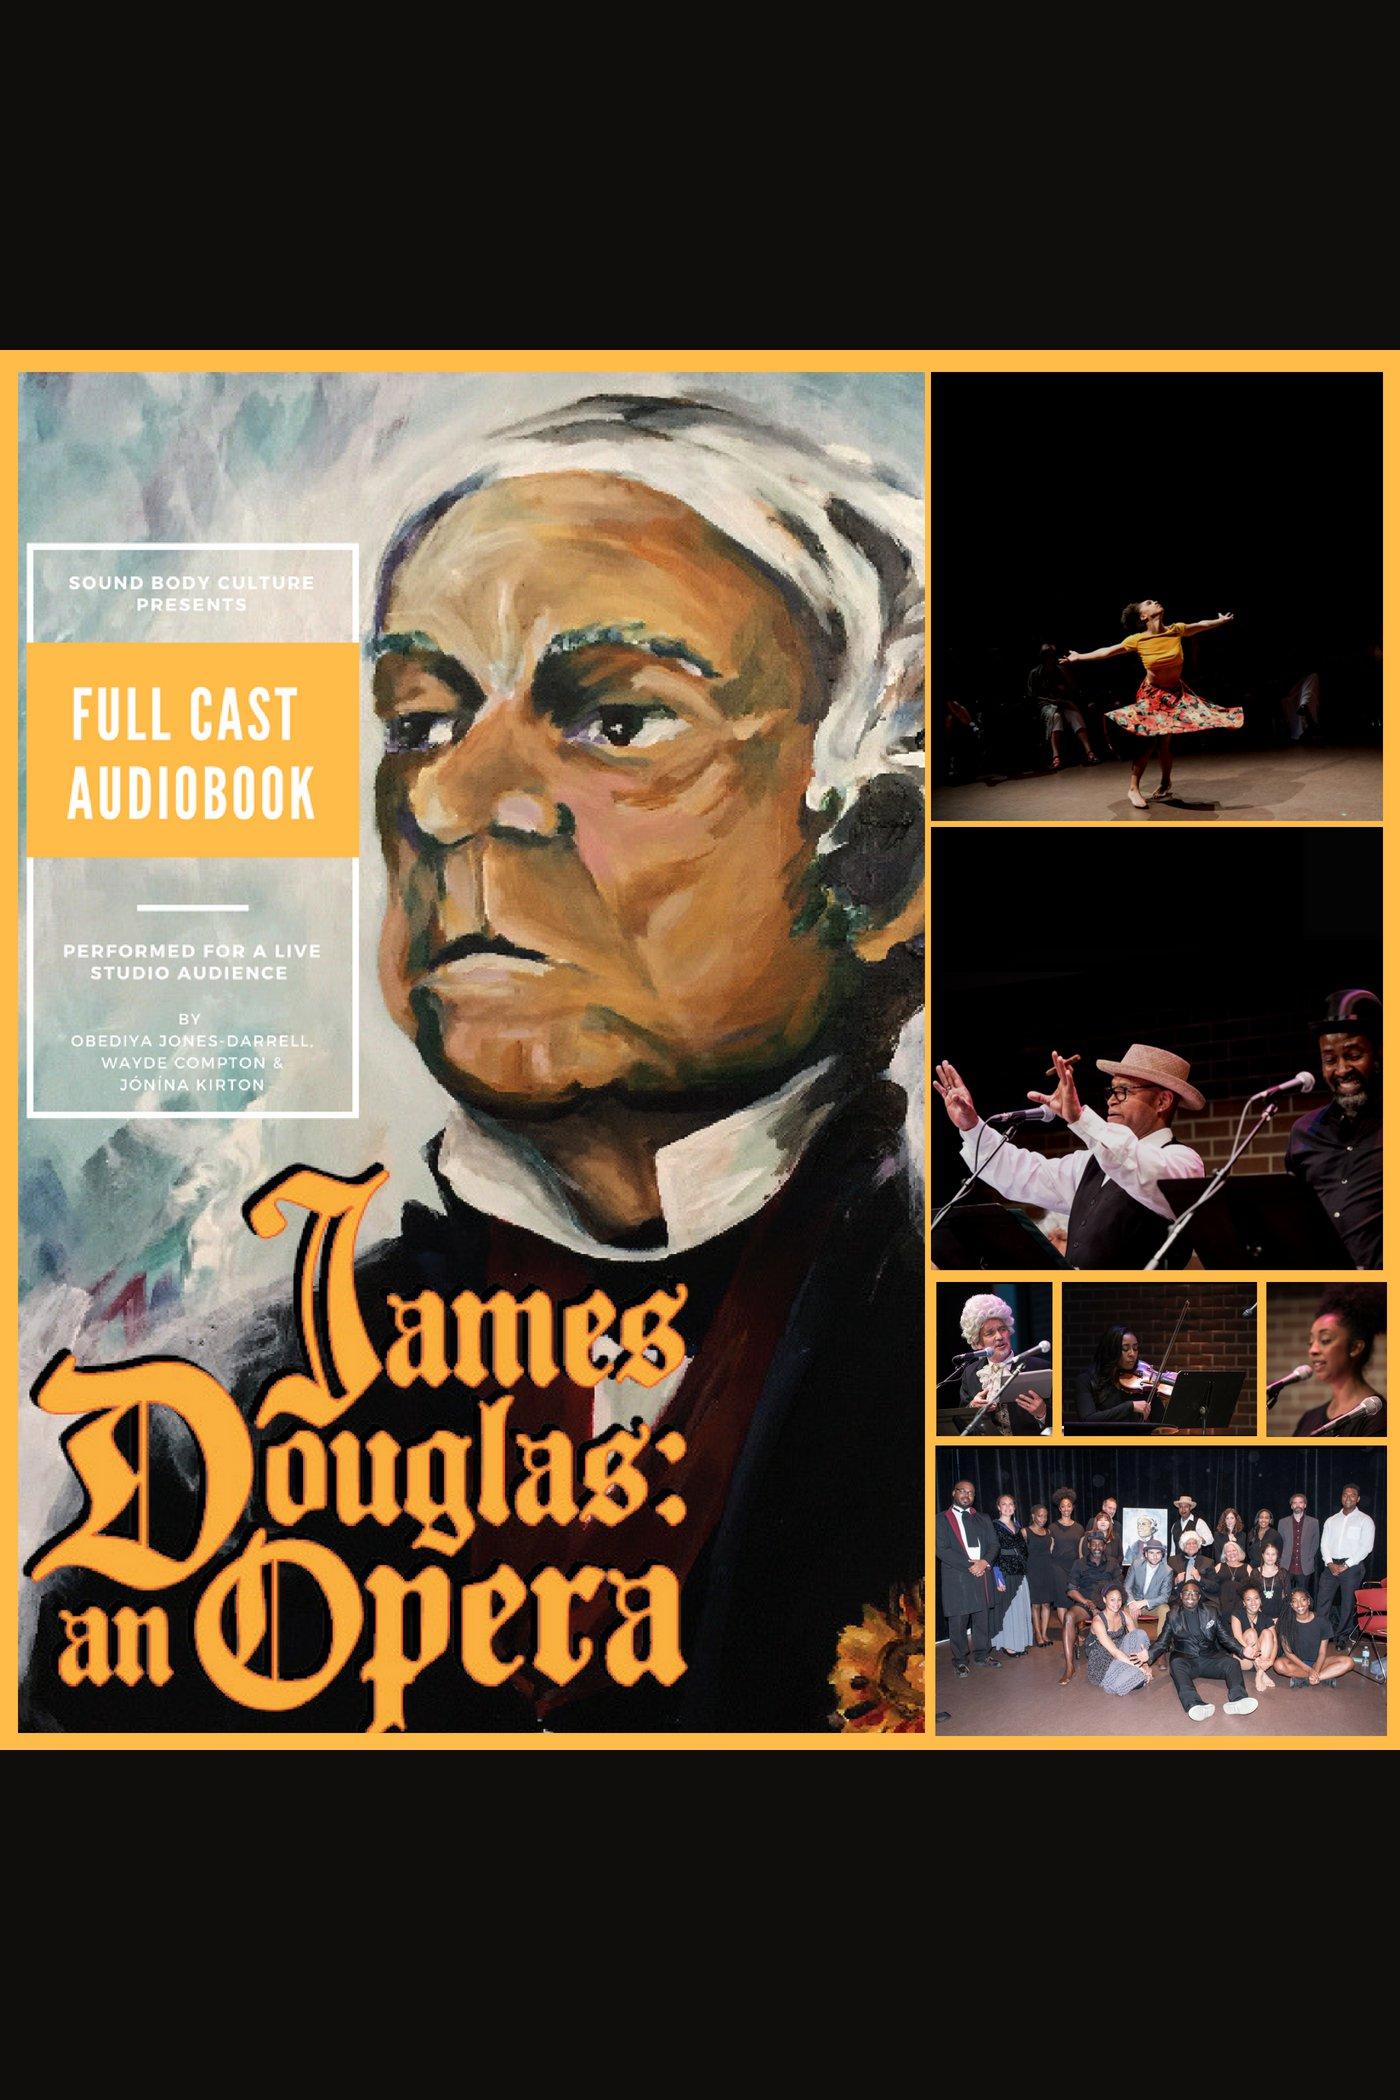 James Douglas An Opera cover image